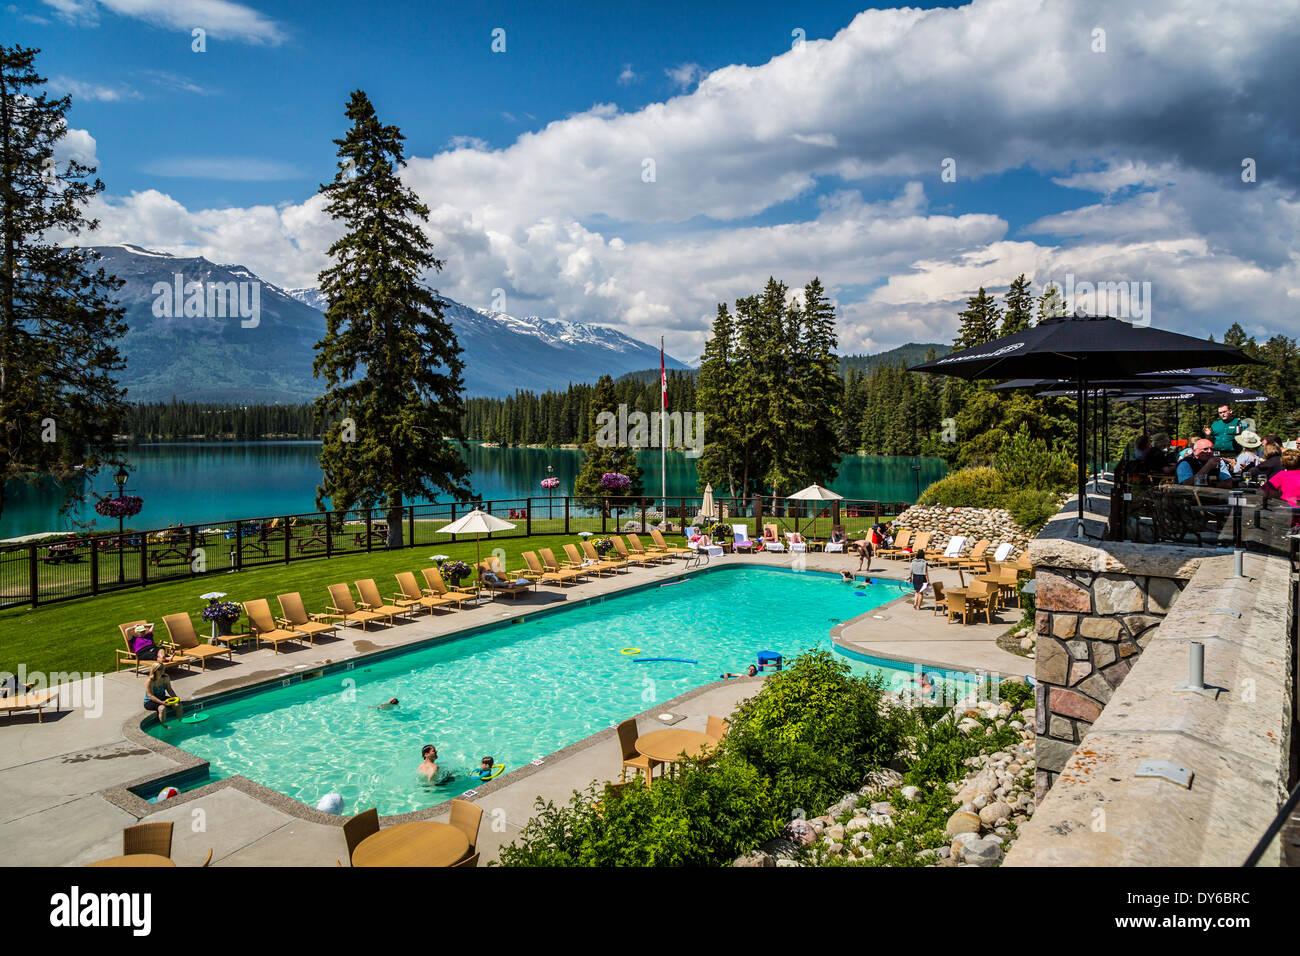 541b4a21451 The swimming pool area at the Fairmont Jasper Park Lodge in Jasper ...